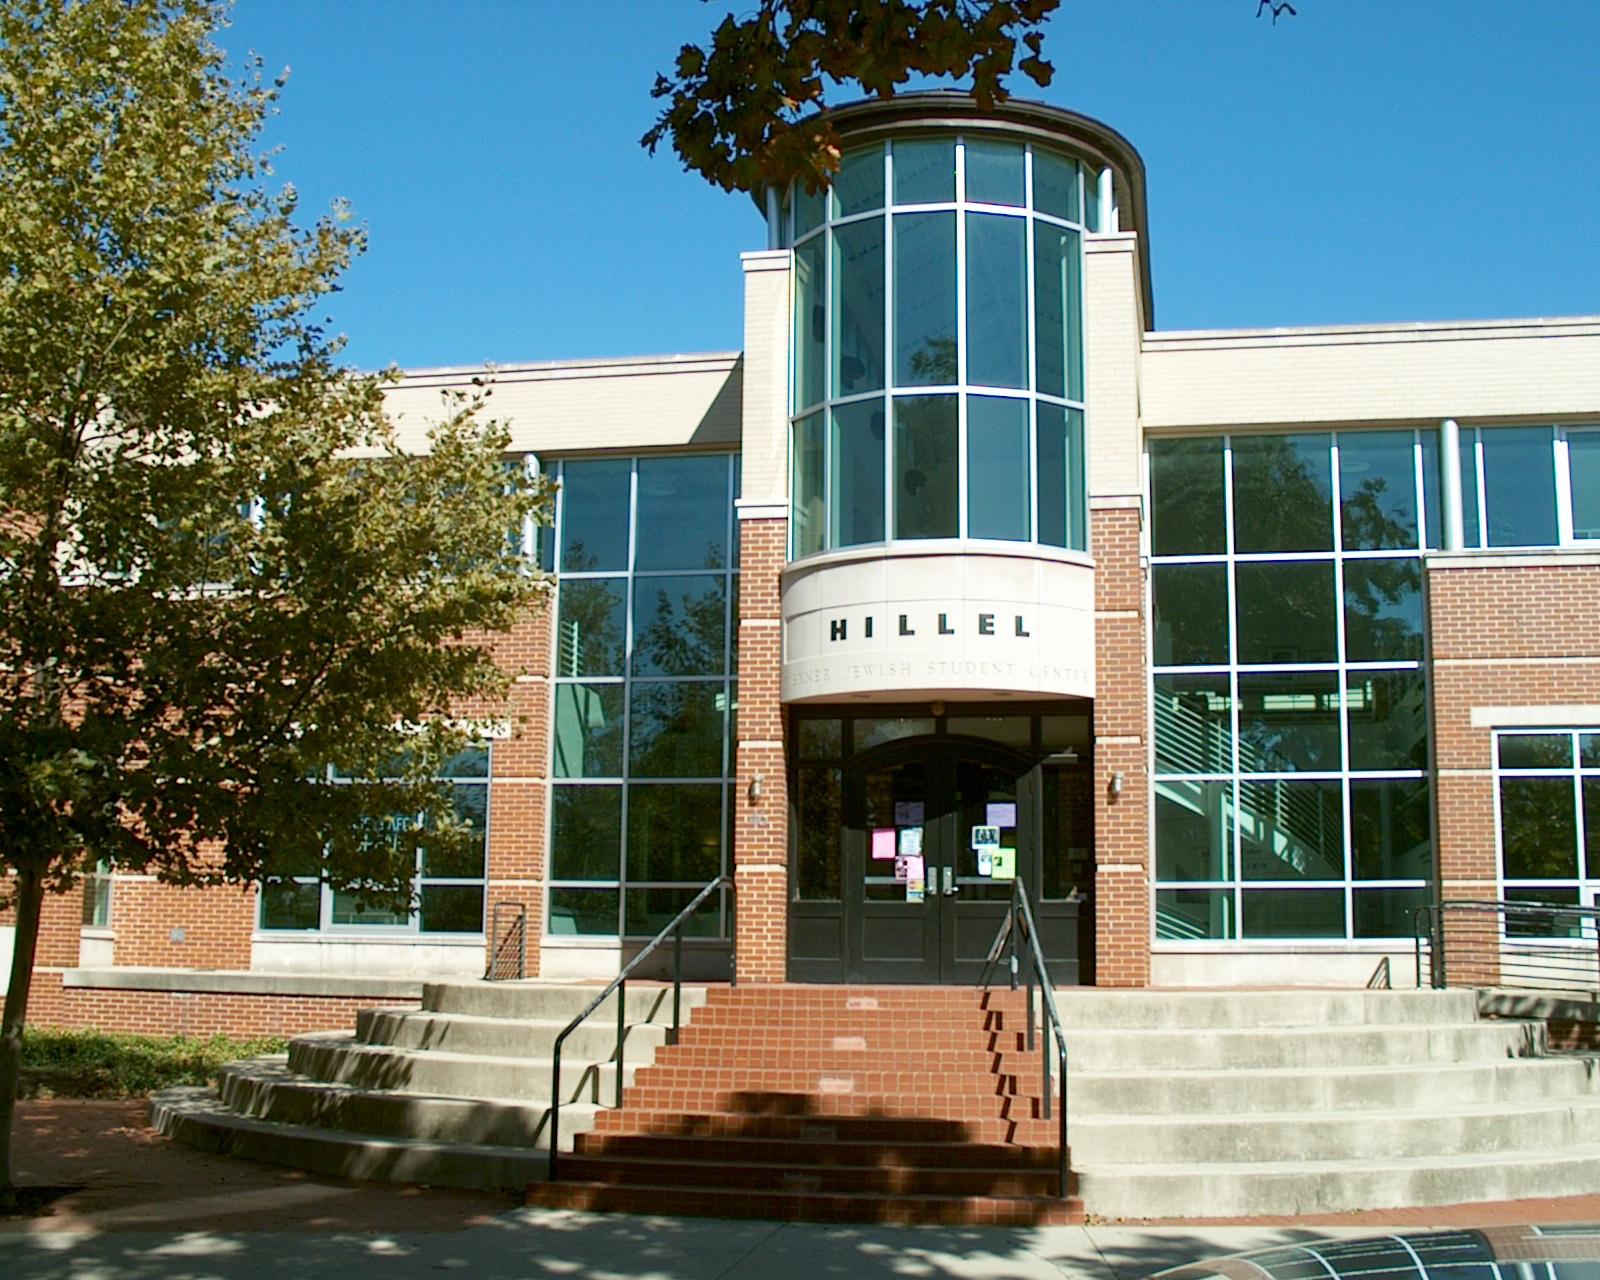 hillel ohio state university